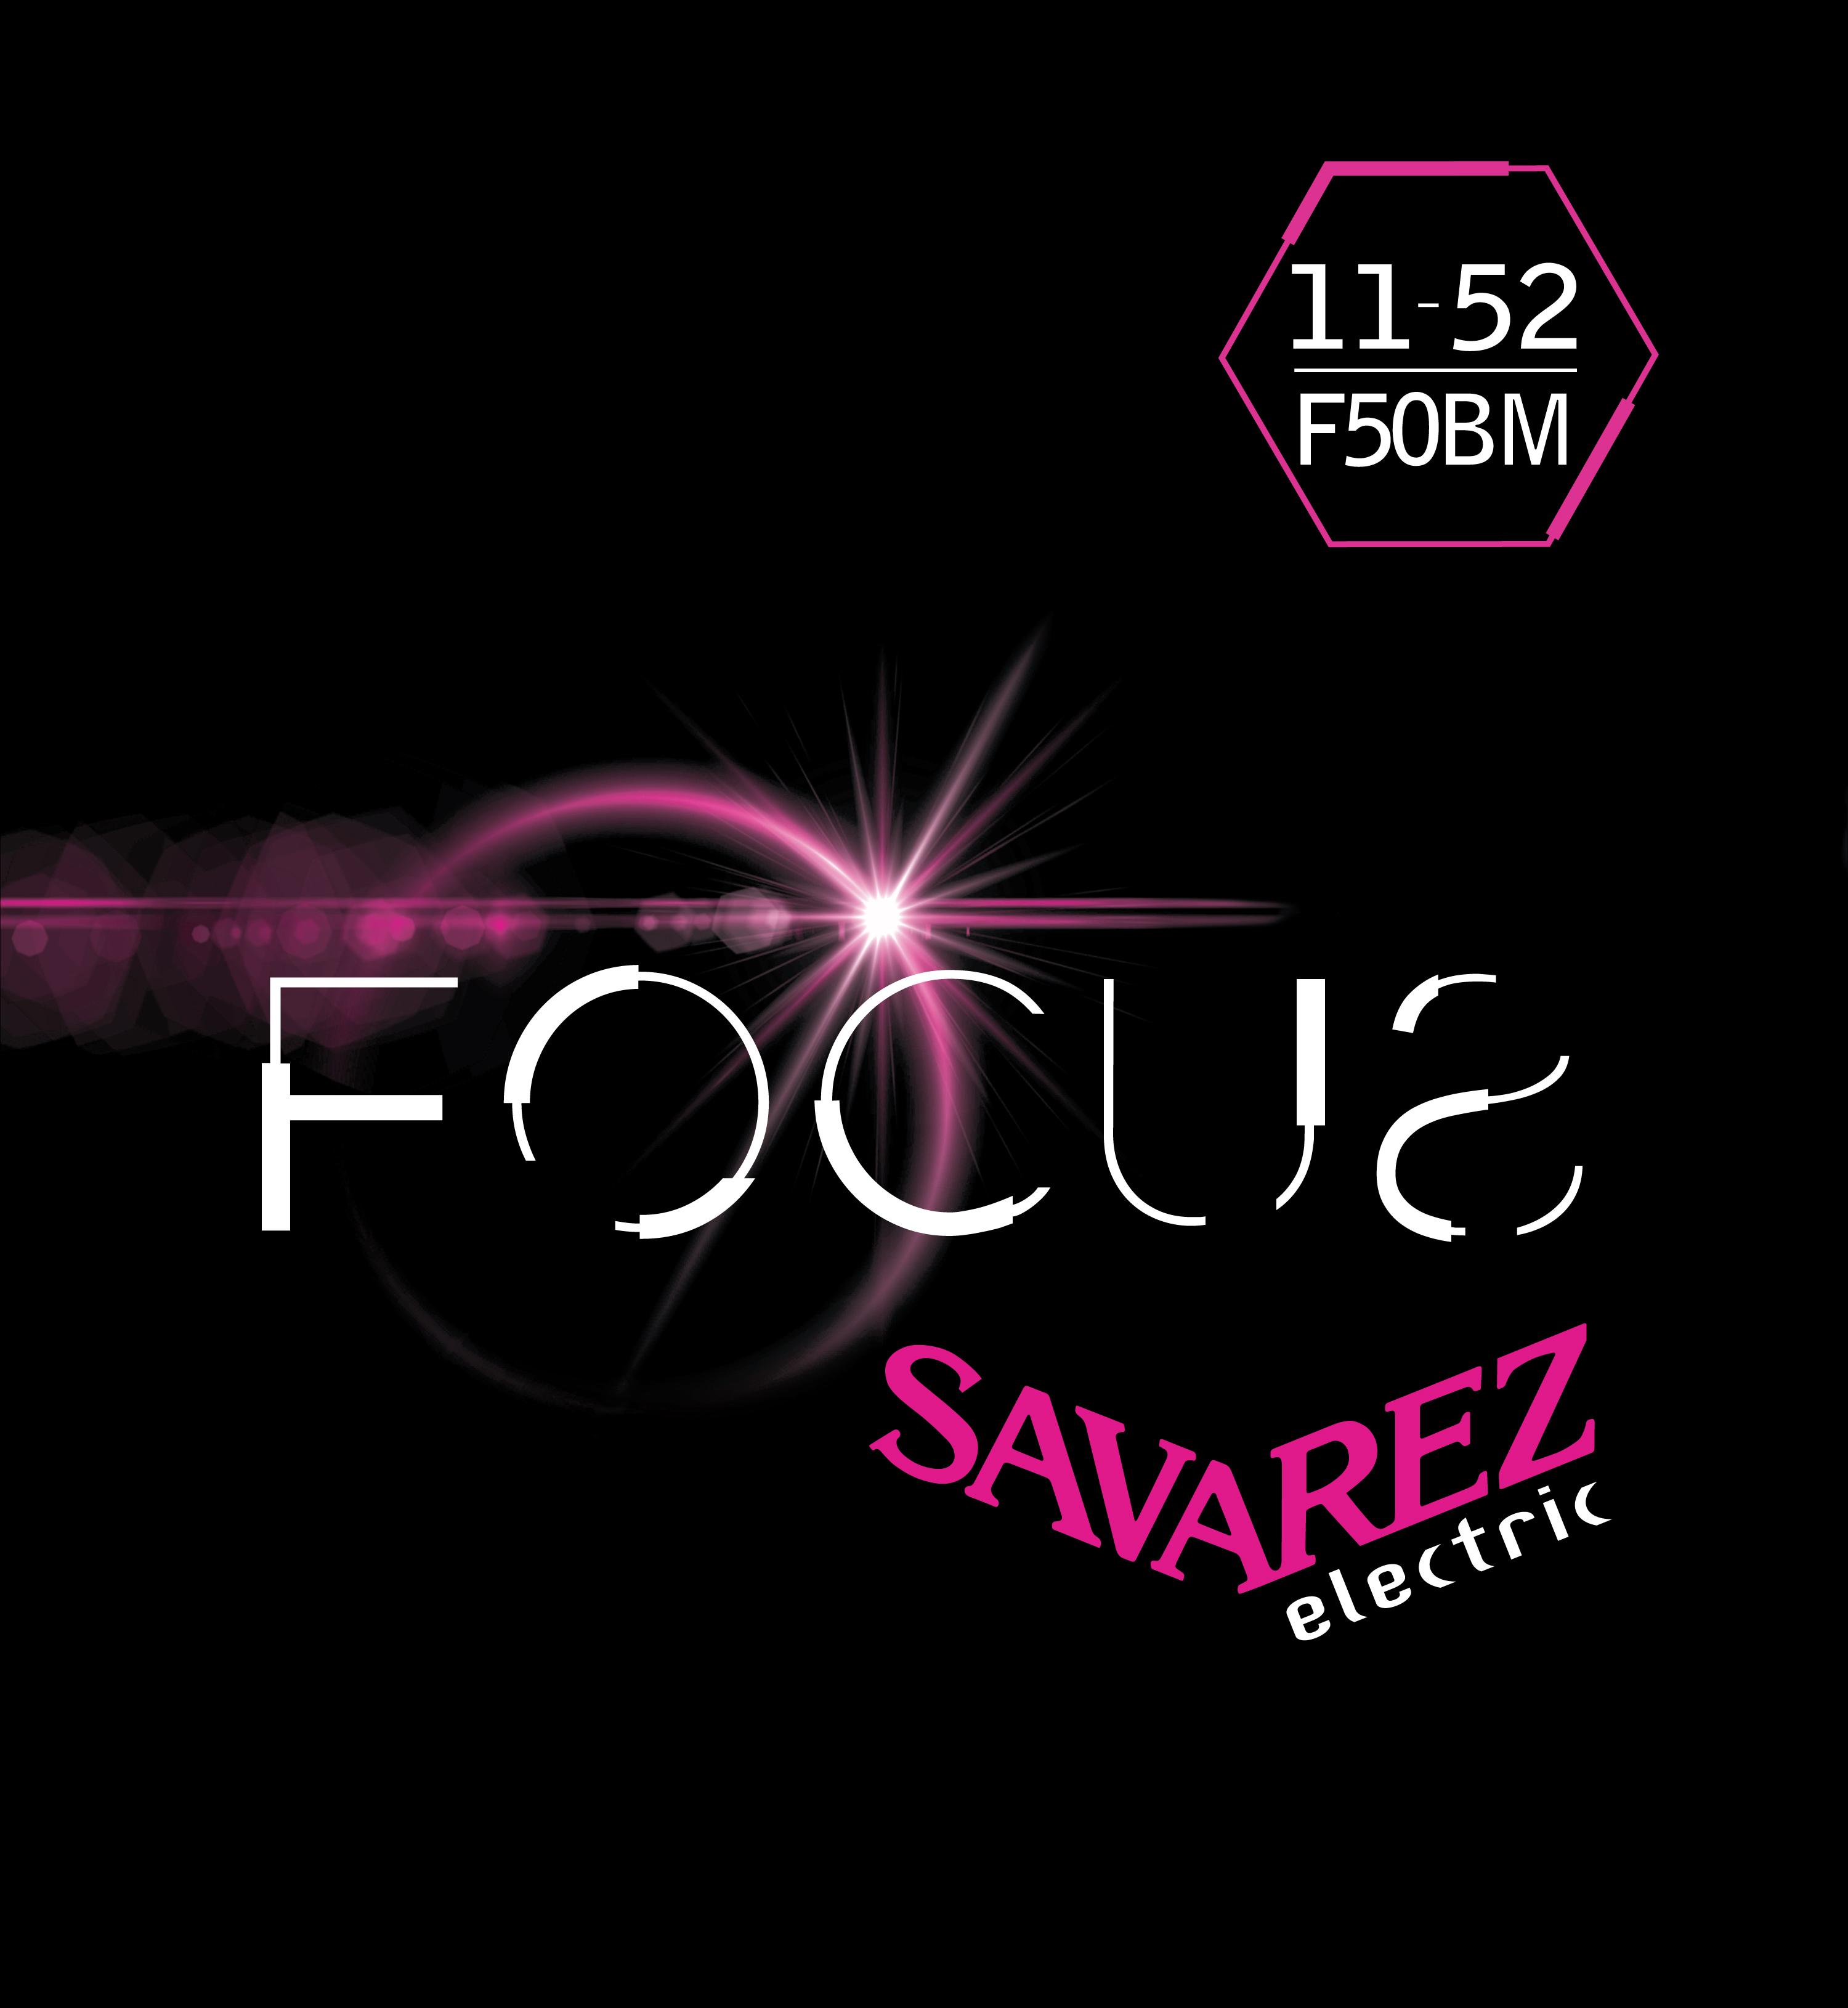 SAVAREZ ELECTRIC FOCUS F50BM